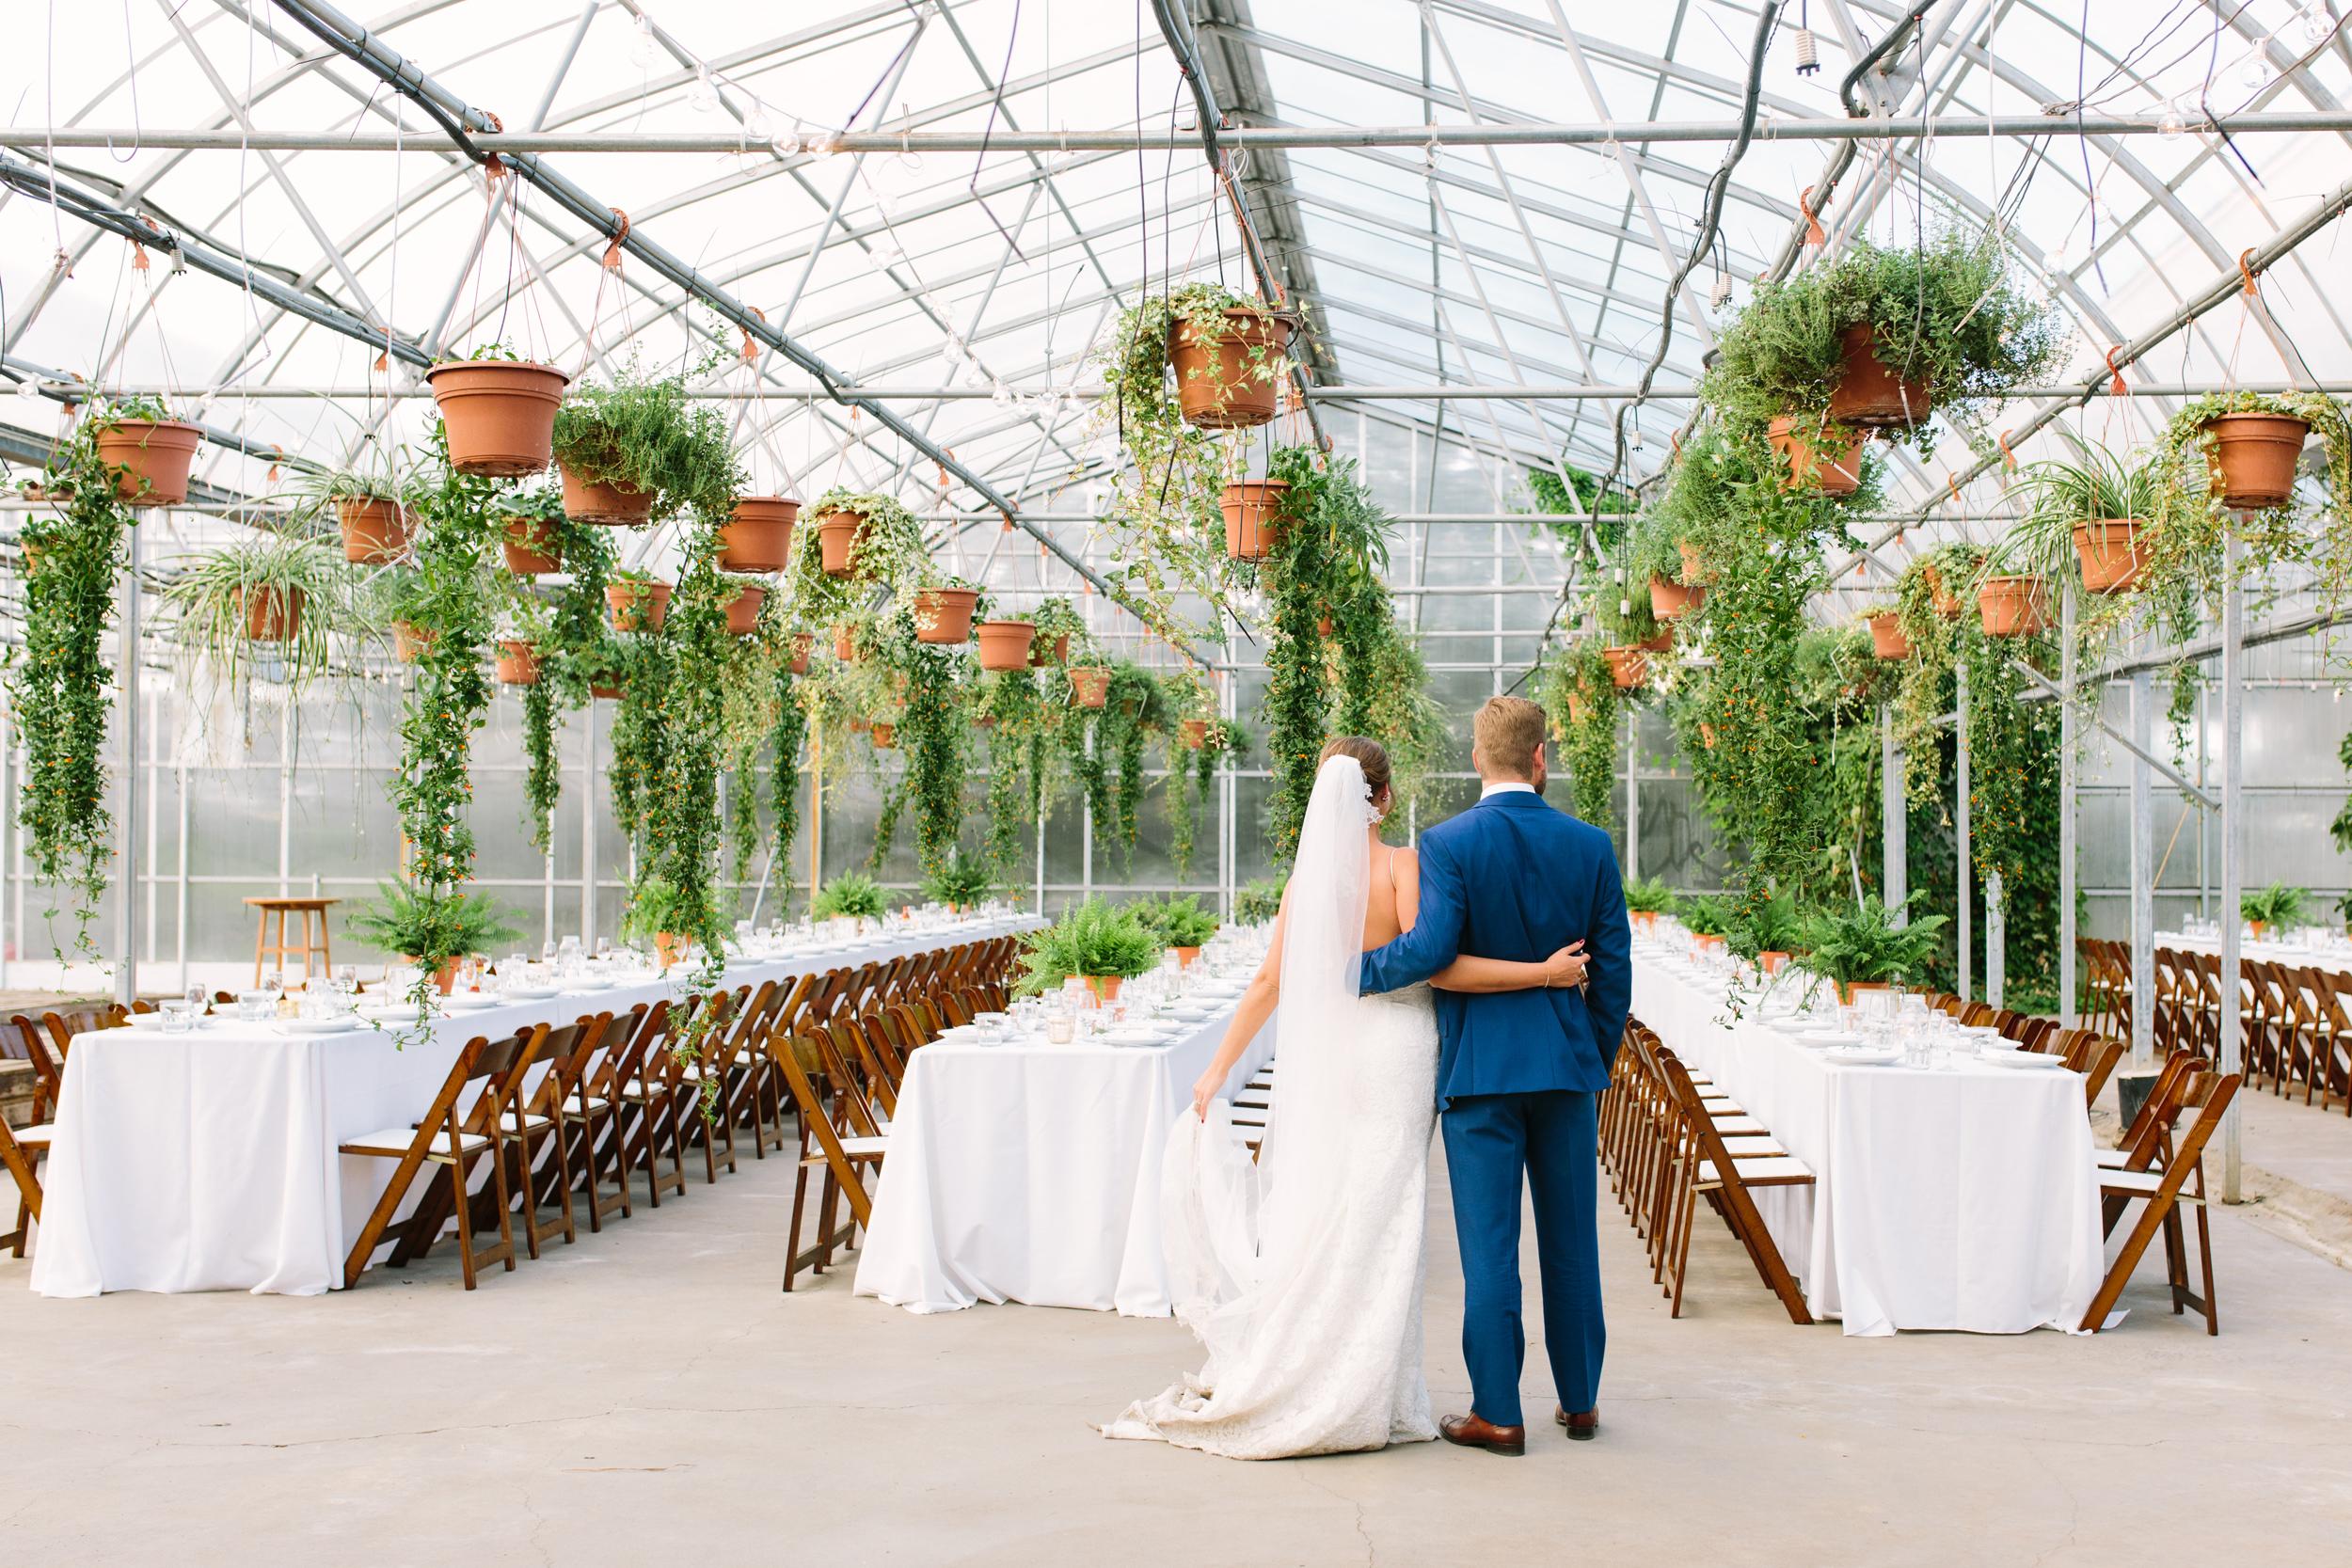 Saskatoon_Farm_Greenhouse_Wedding0050.jpg